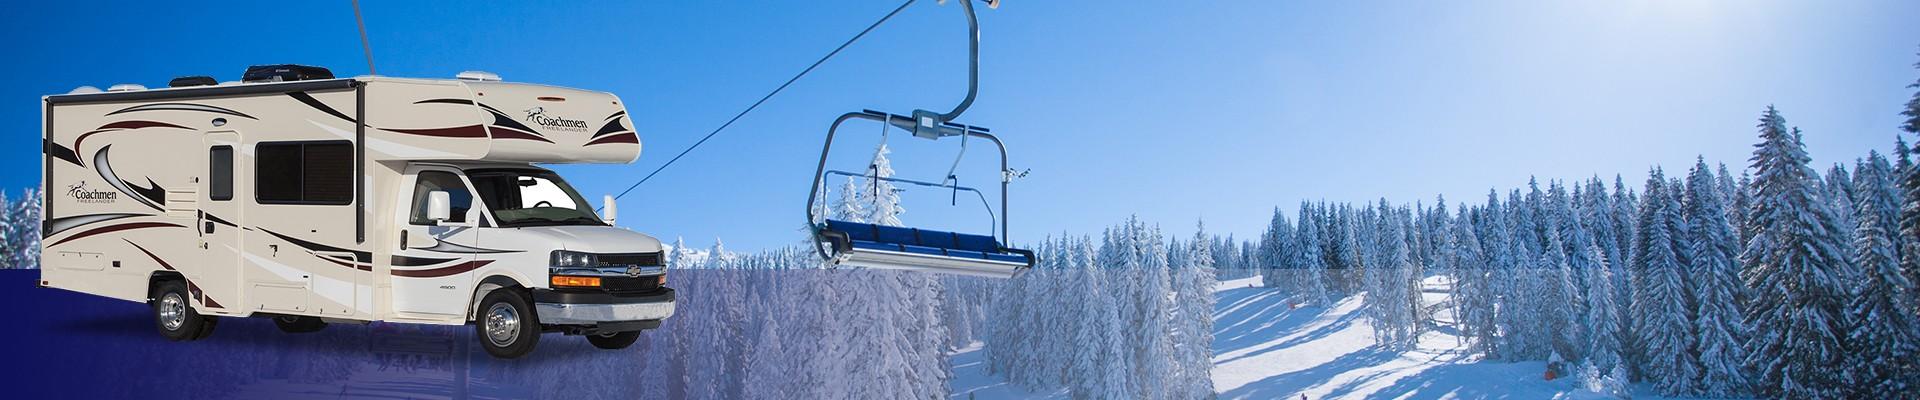 RVs good for skiers - Coachmen Freelander 21QB